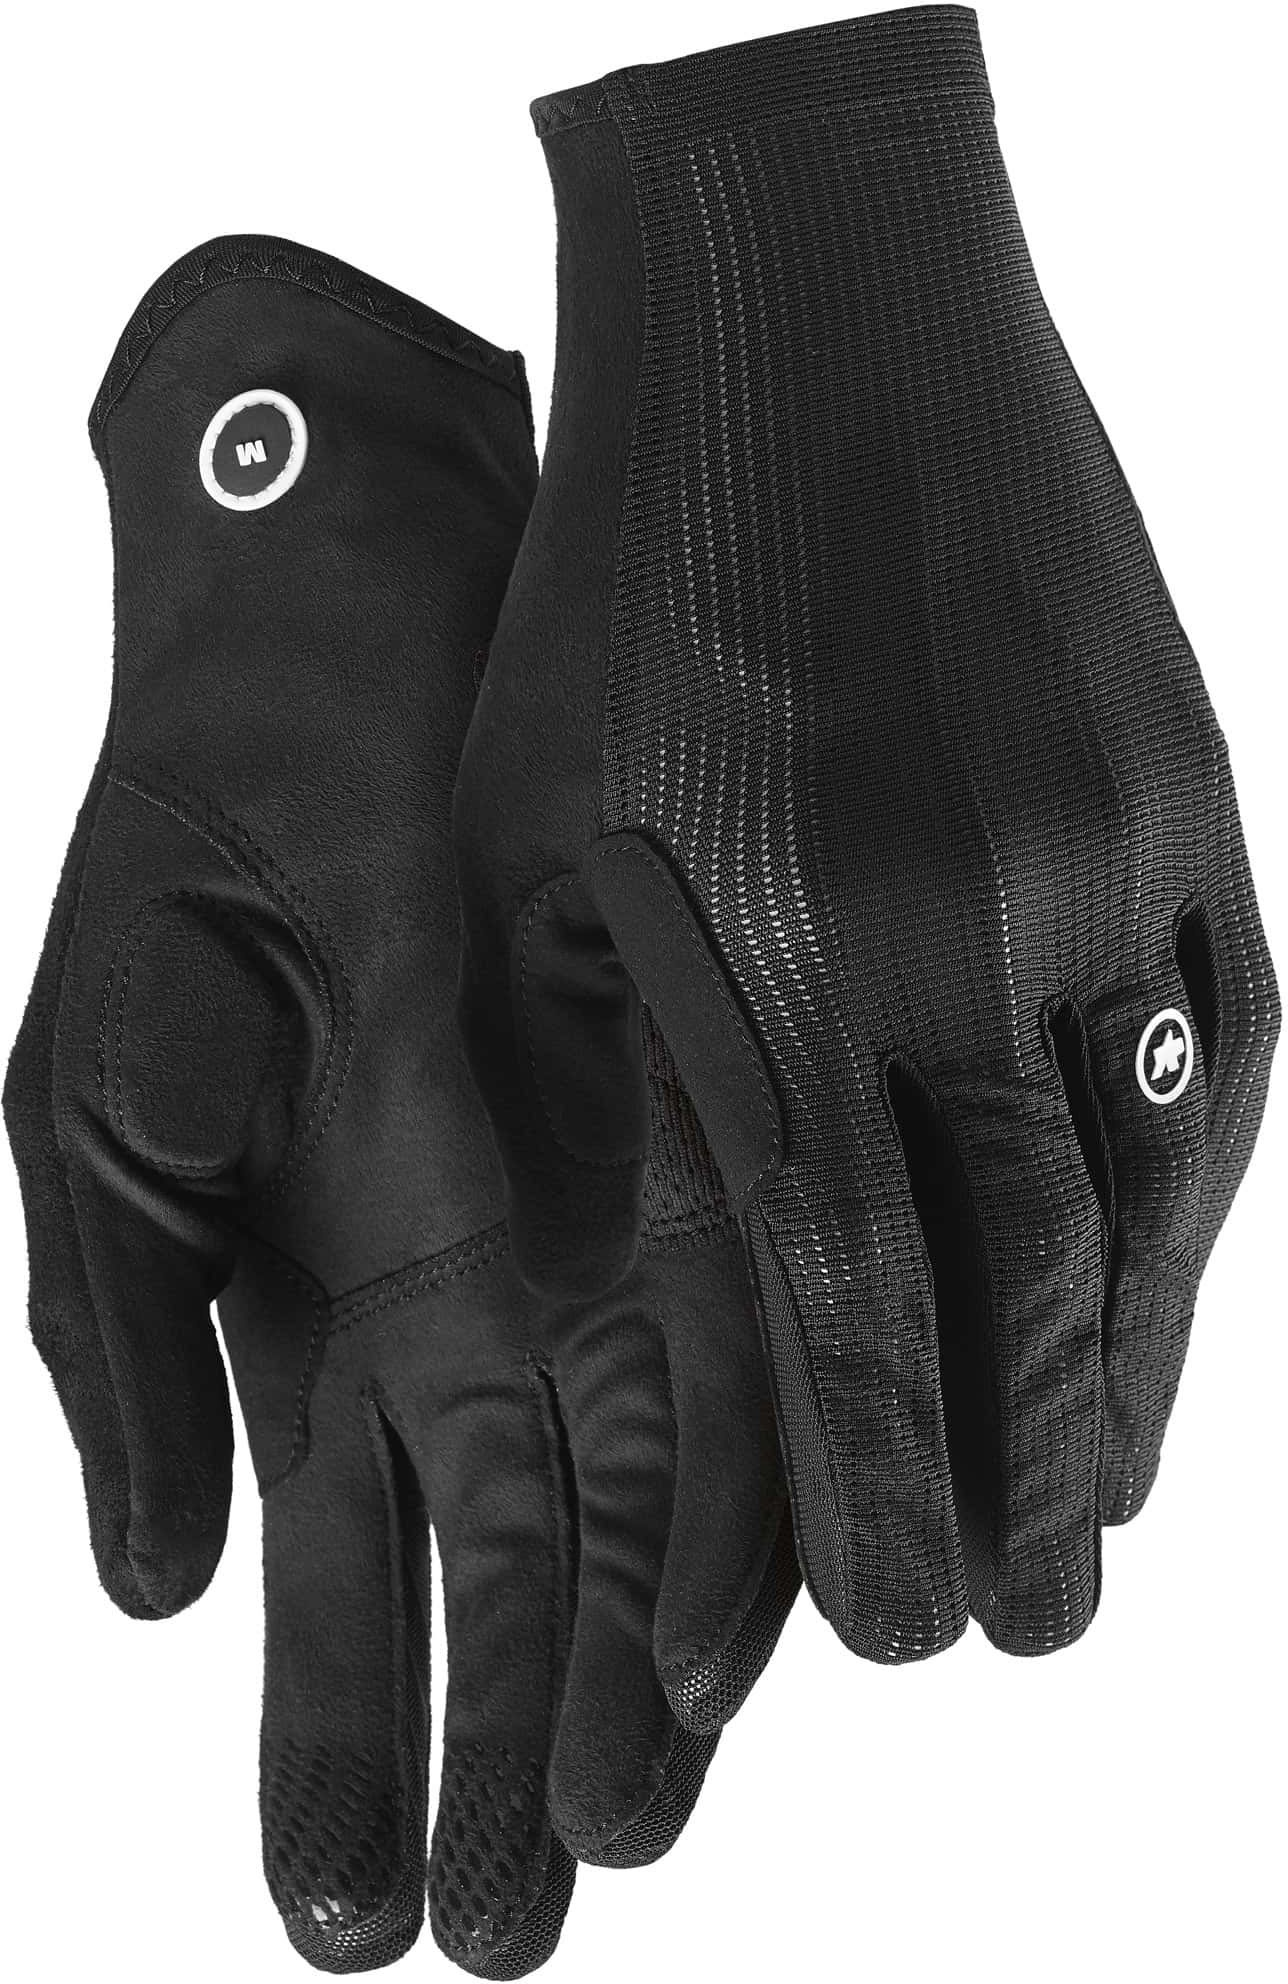 Assos XC FF Gloves Cykelhandsker - Sort